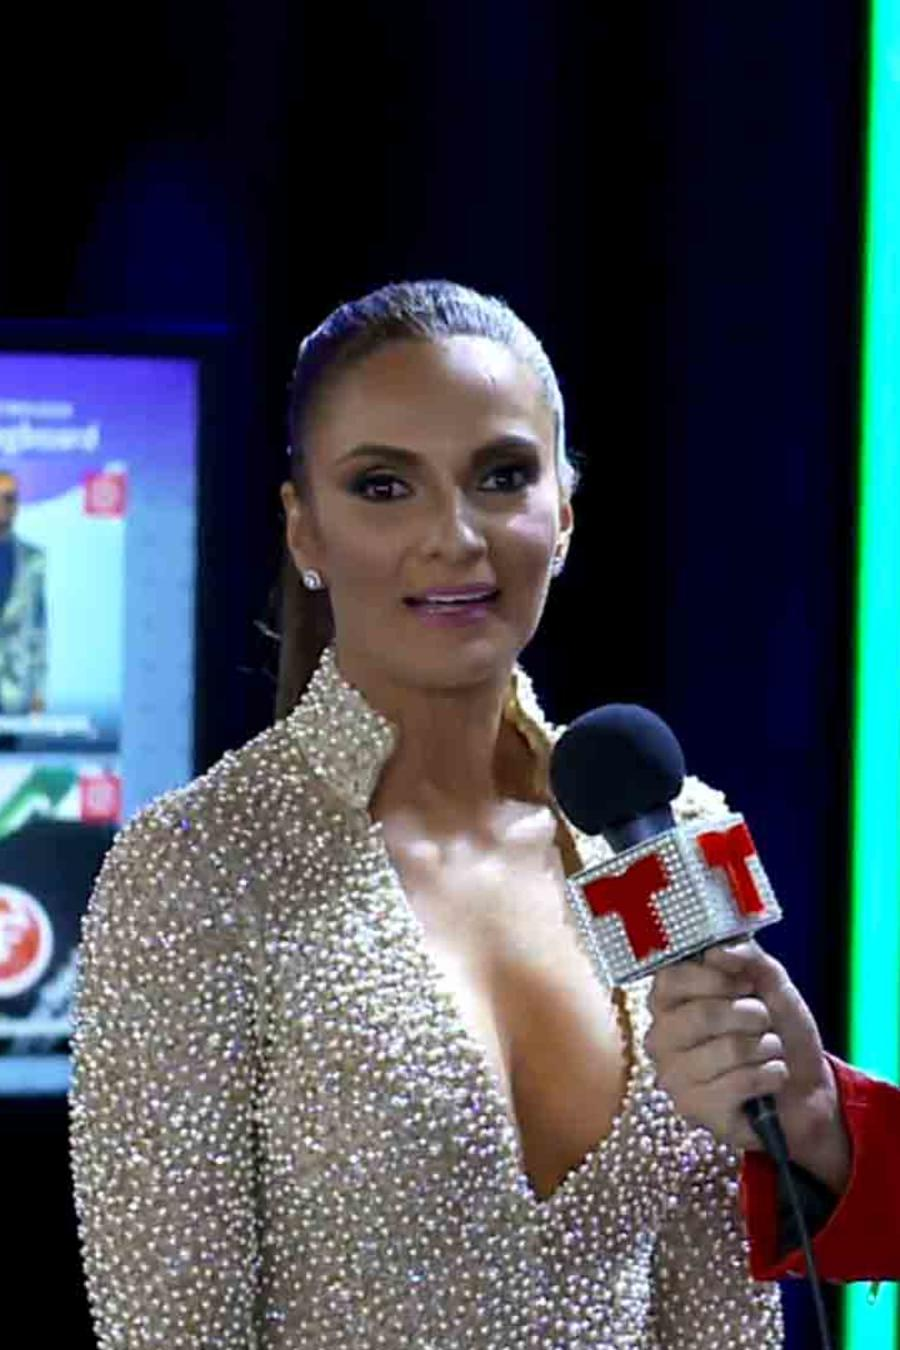 Mariana Seoane y Christian Acosta en Premios Tu Mundo 2016